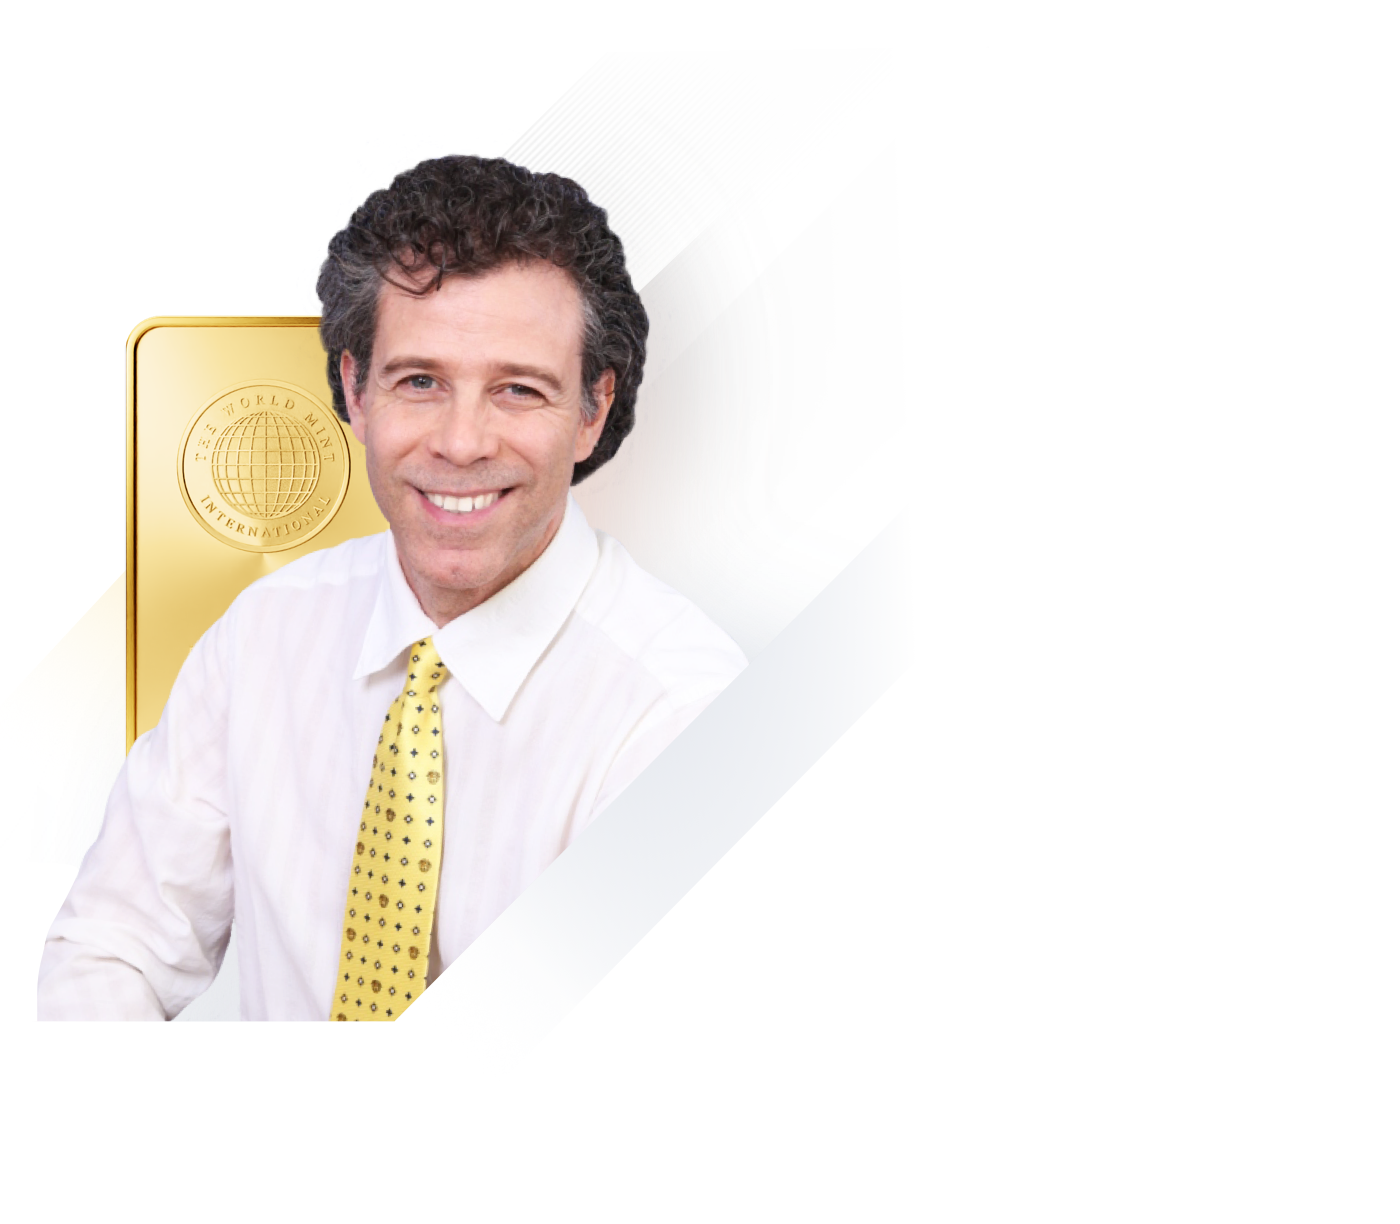 IT_KV_gold_course_Carlo_Vallotto_1400x1224